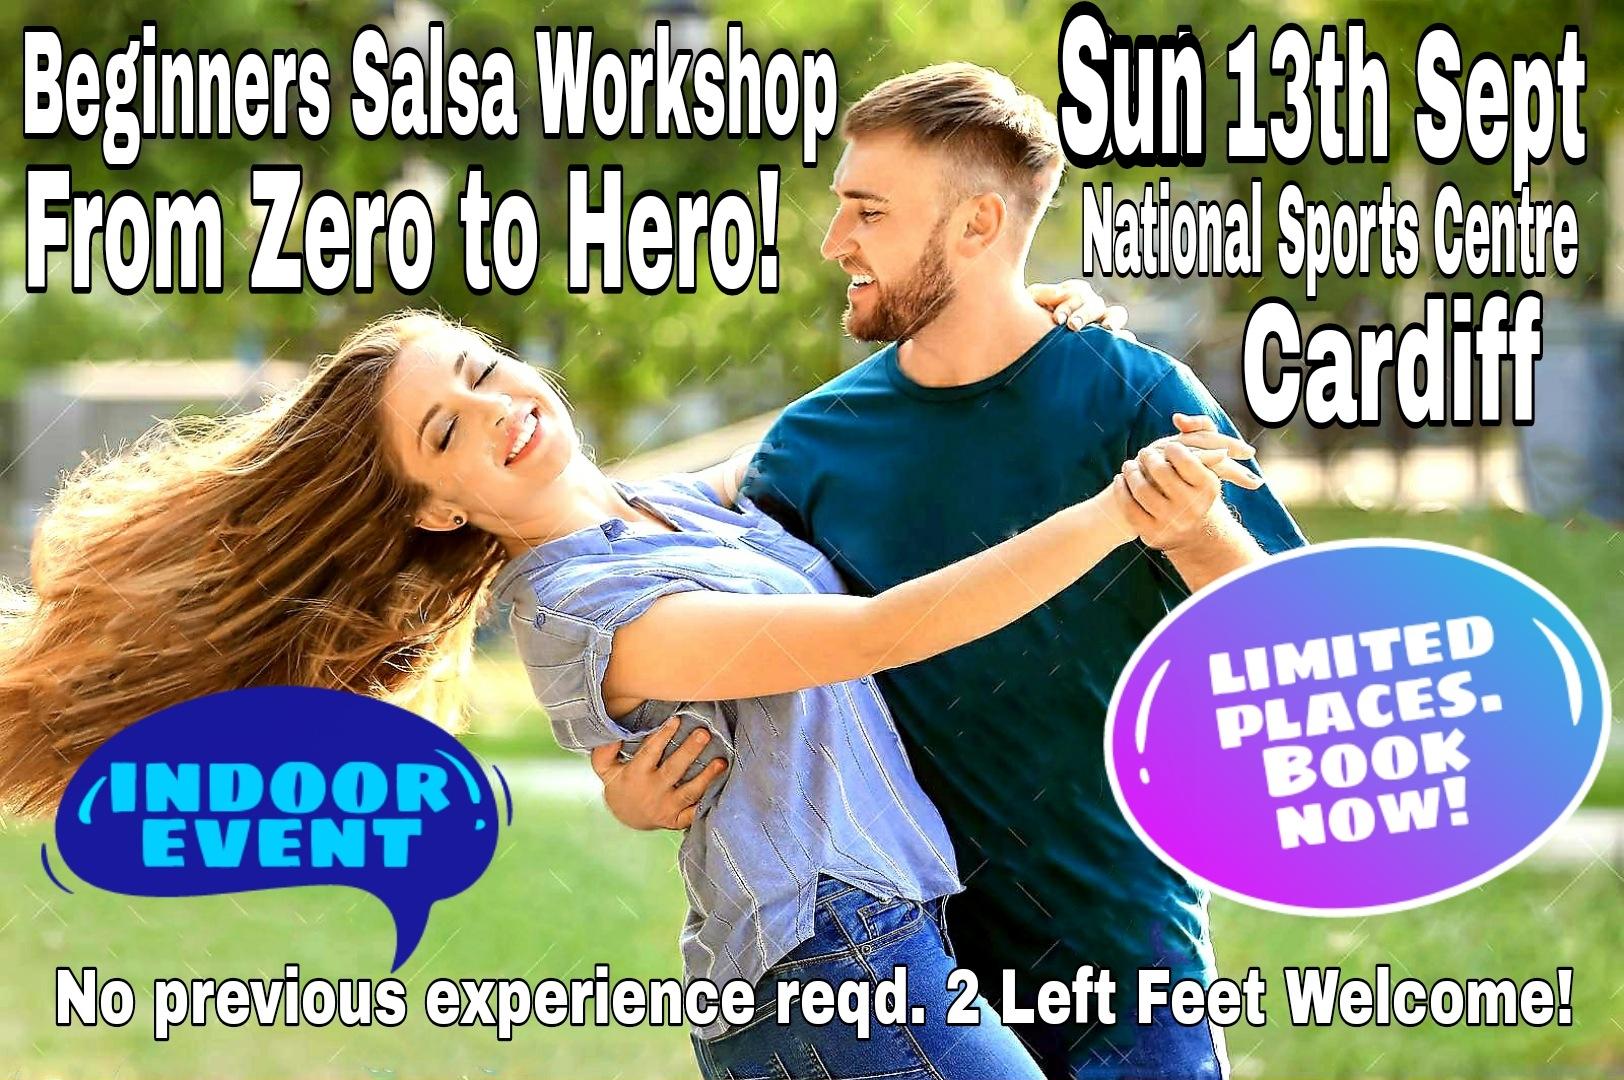 Beginner Level Salsa Workshop